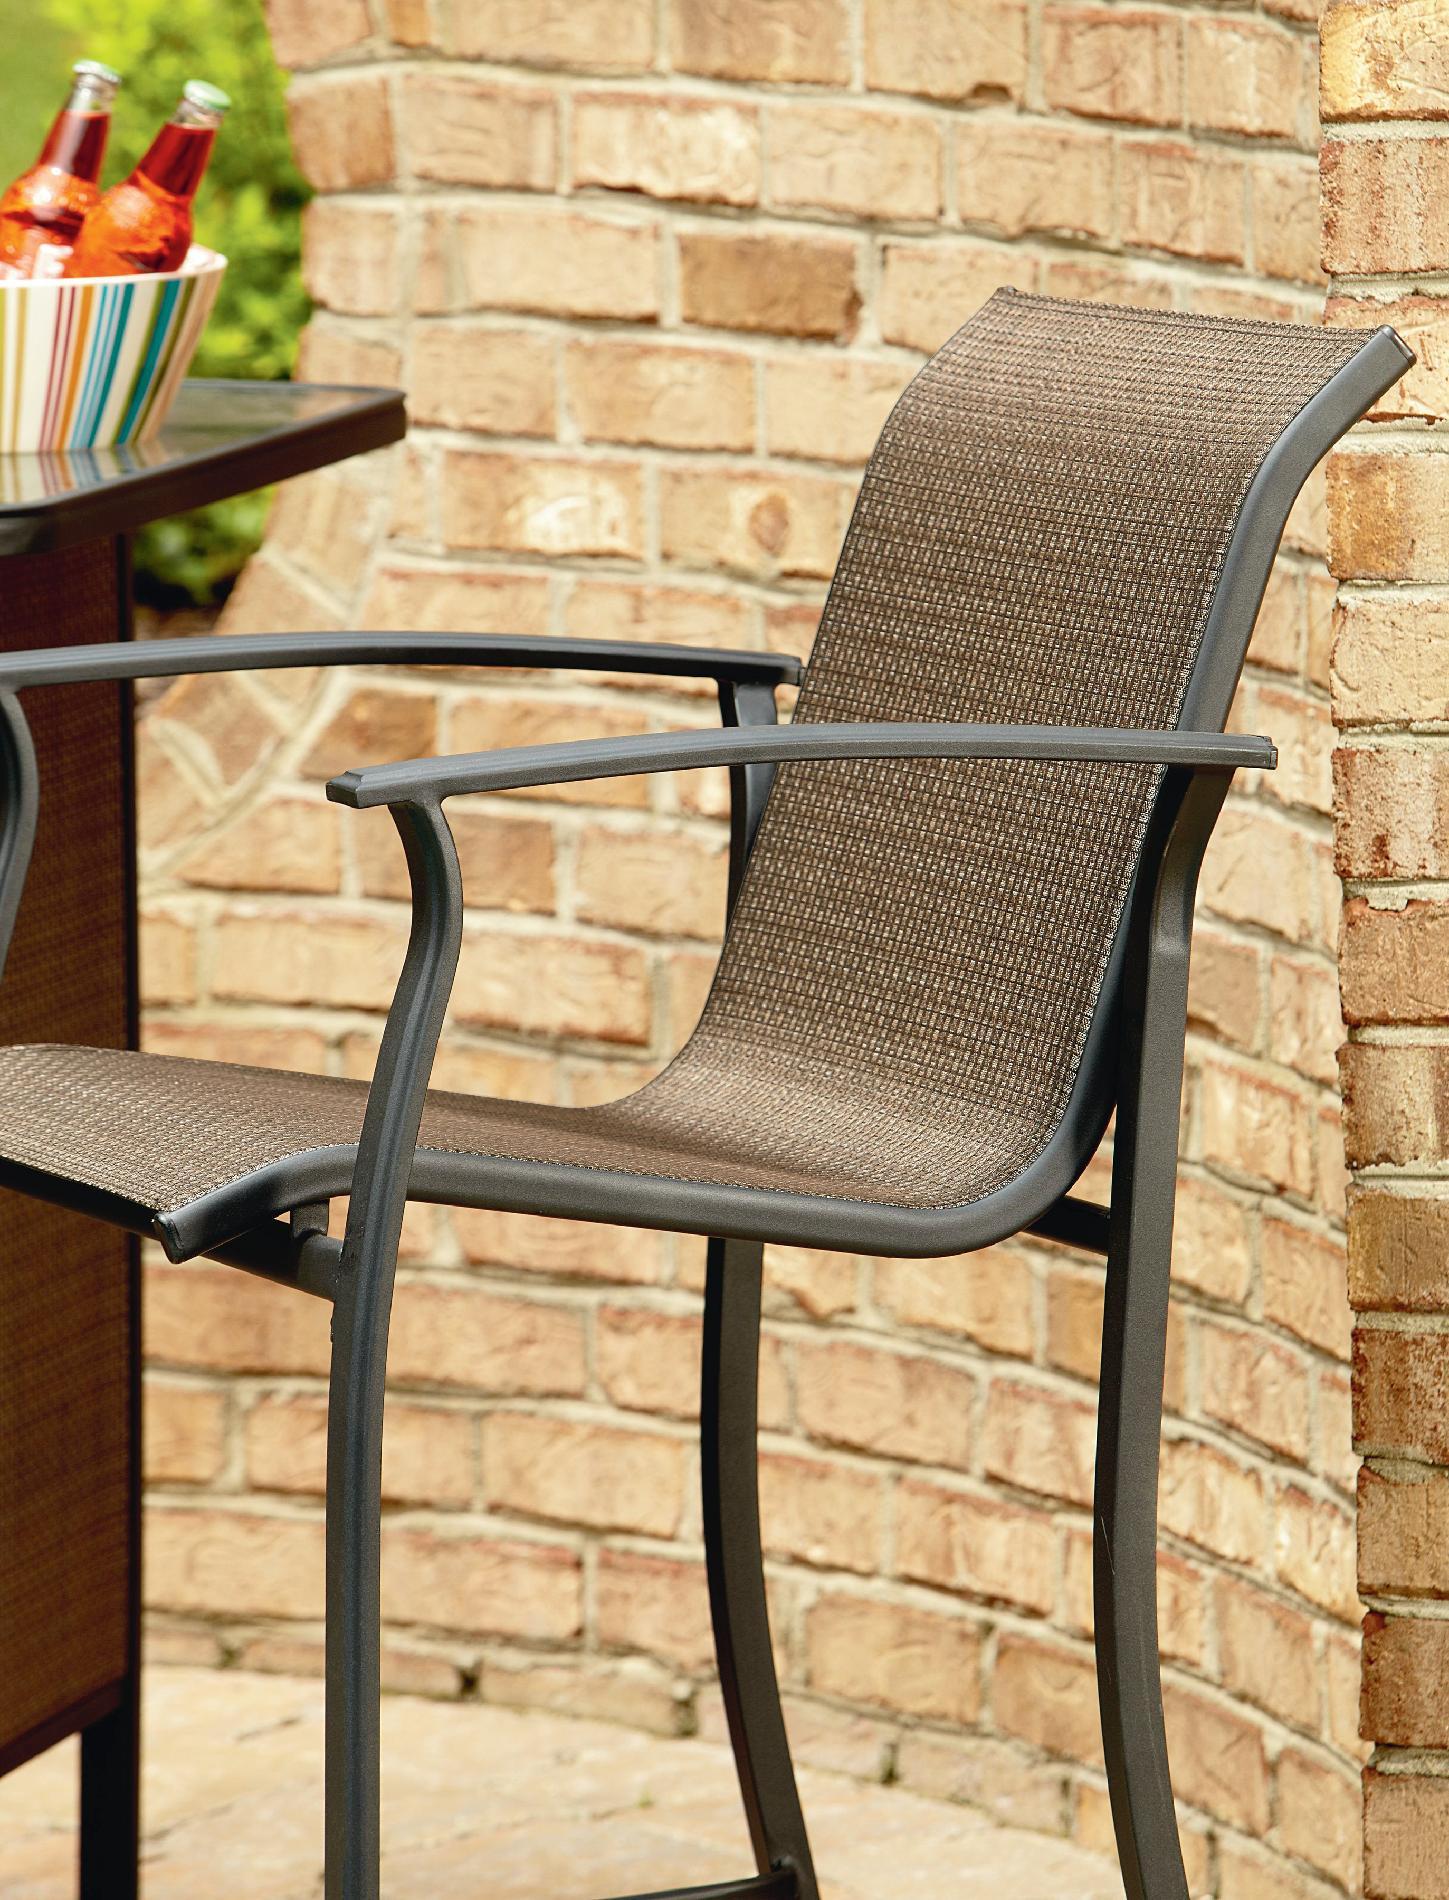 Garden Oasis Harrison 5 Piece Bar Set  Outdoor Living  Patio Furniture  Bars